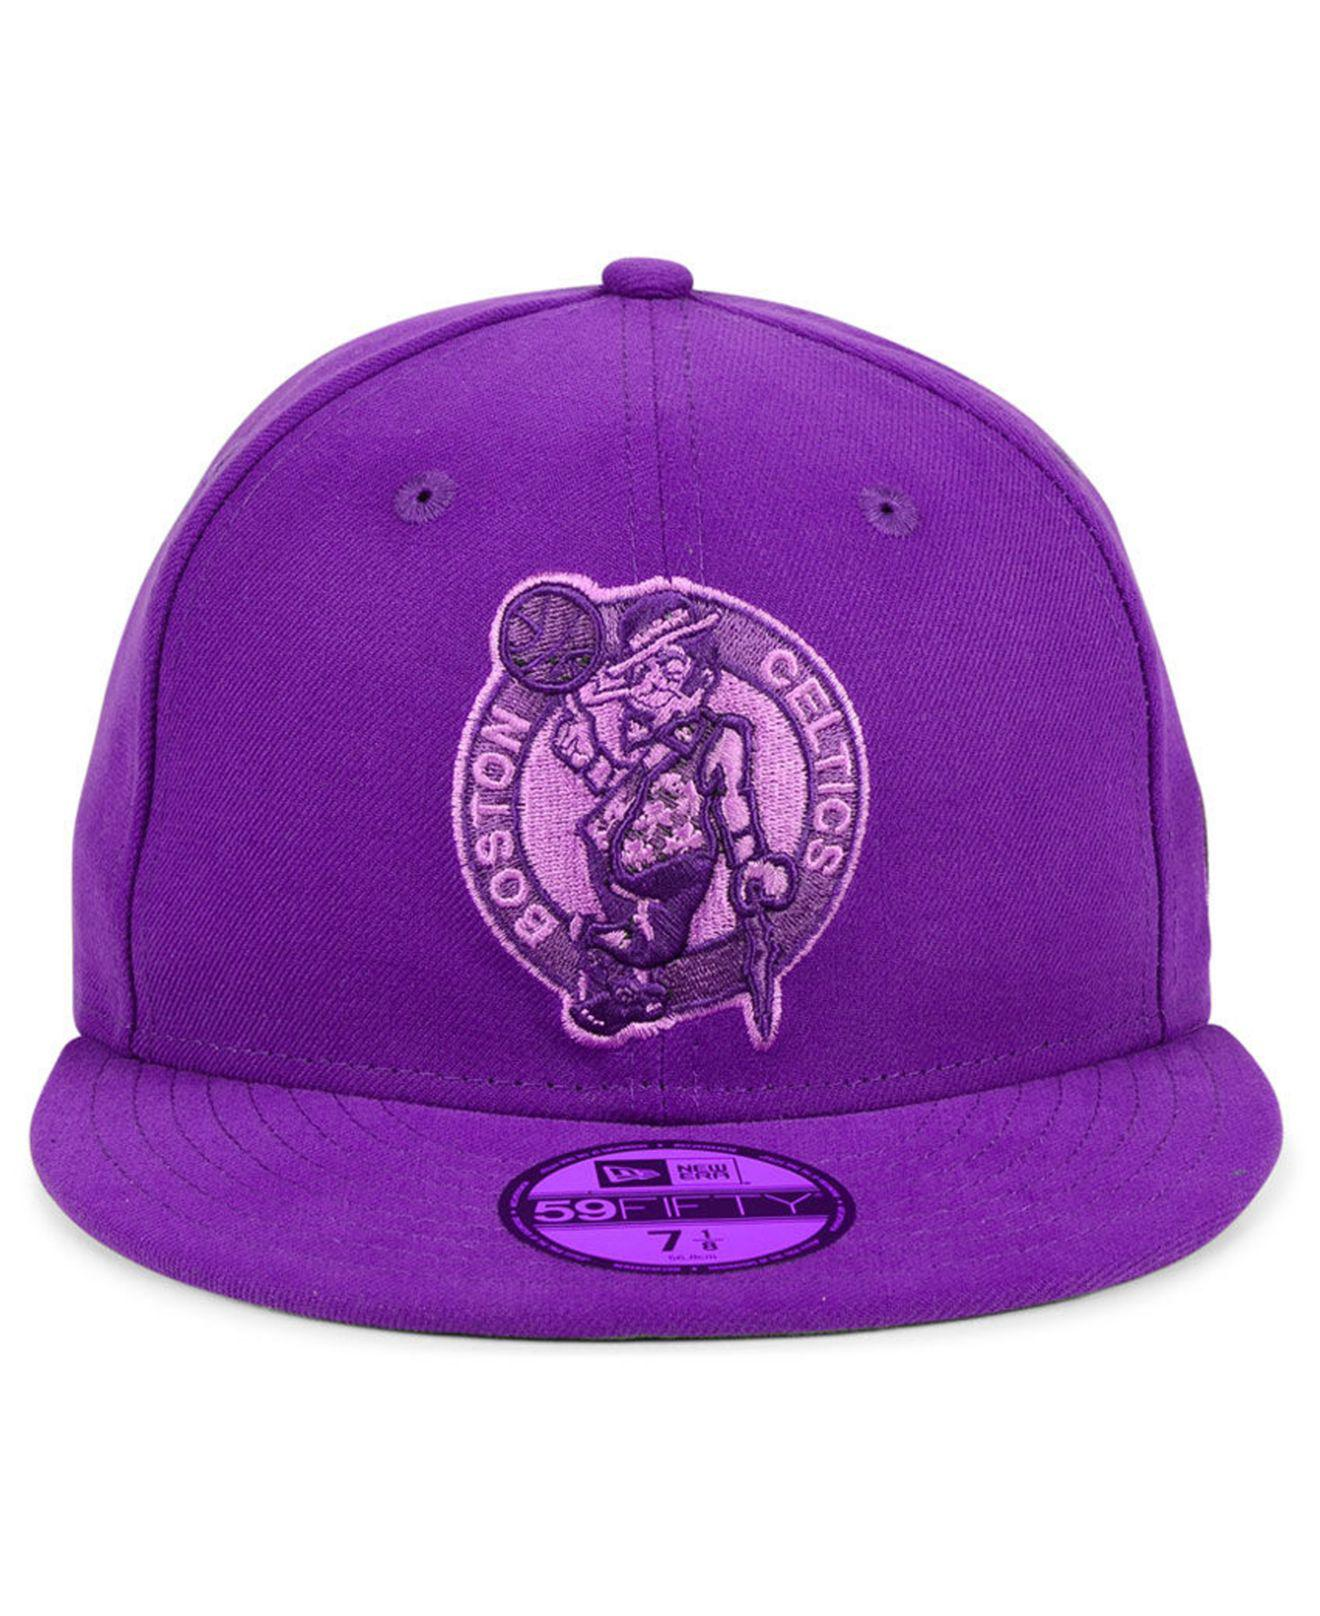 huge discount 9b1ca 2e9c9 KTZ Boston Celtics Color Prism Pack 59fifty Cap in Purple for Men - Lyst